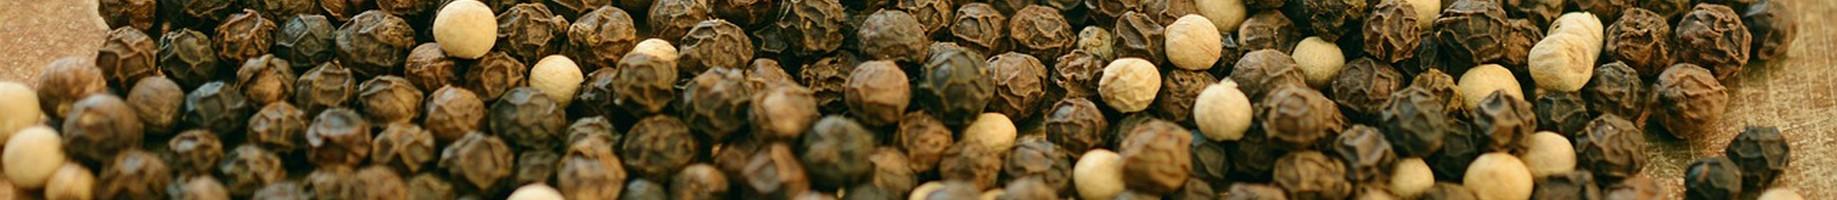 peppercorns-1992412_1280